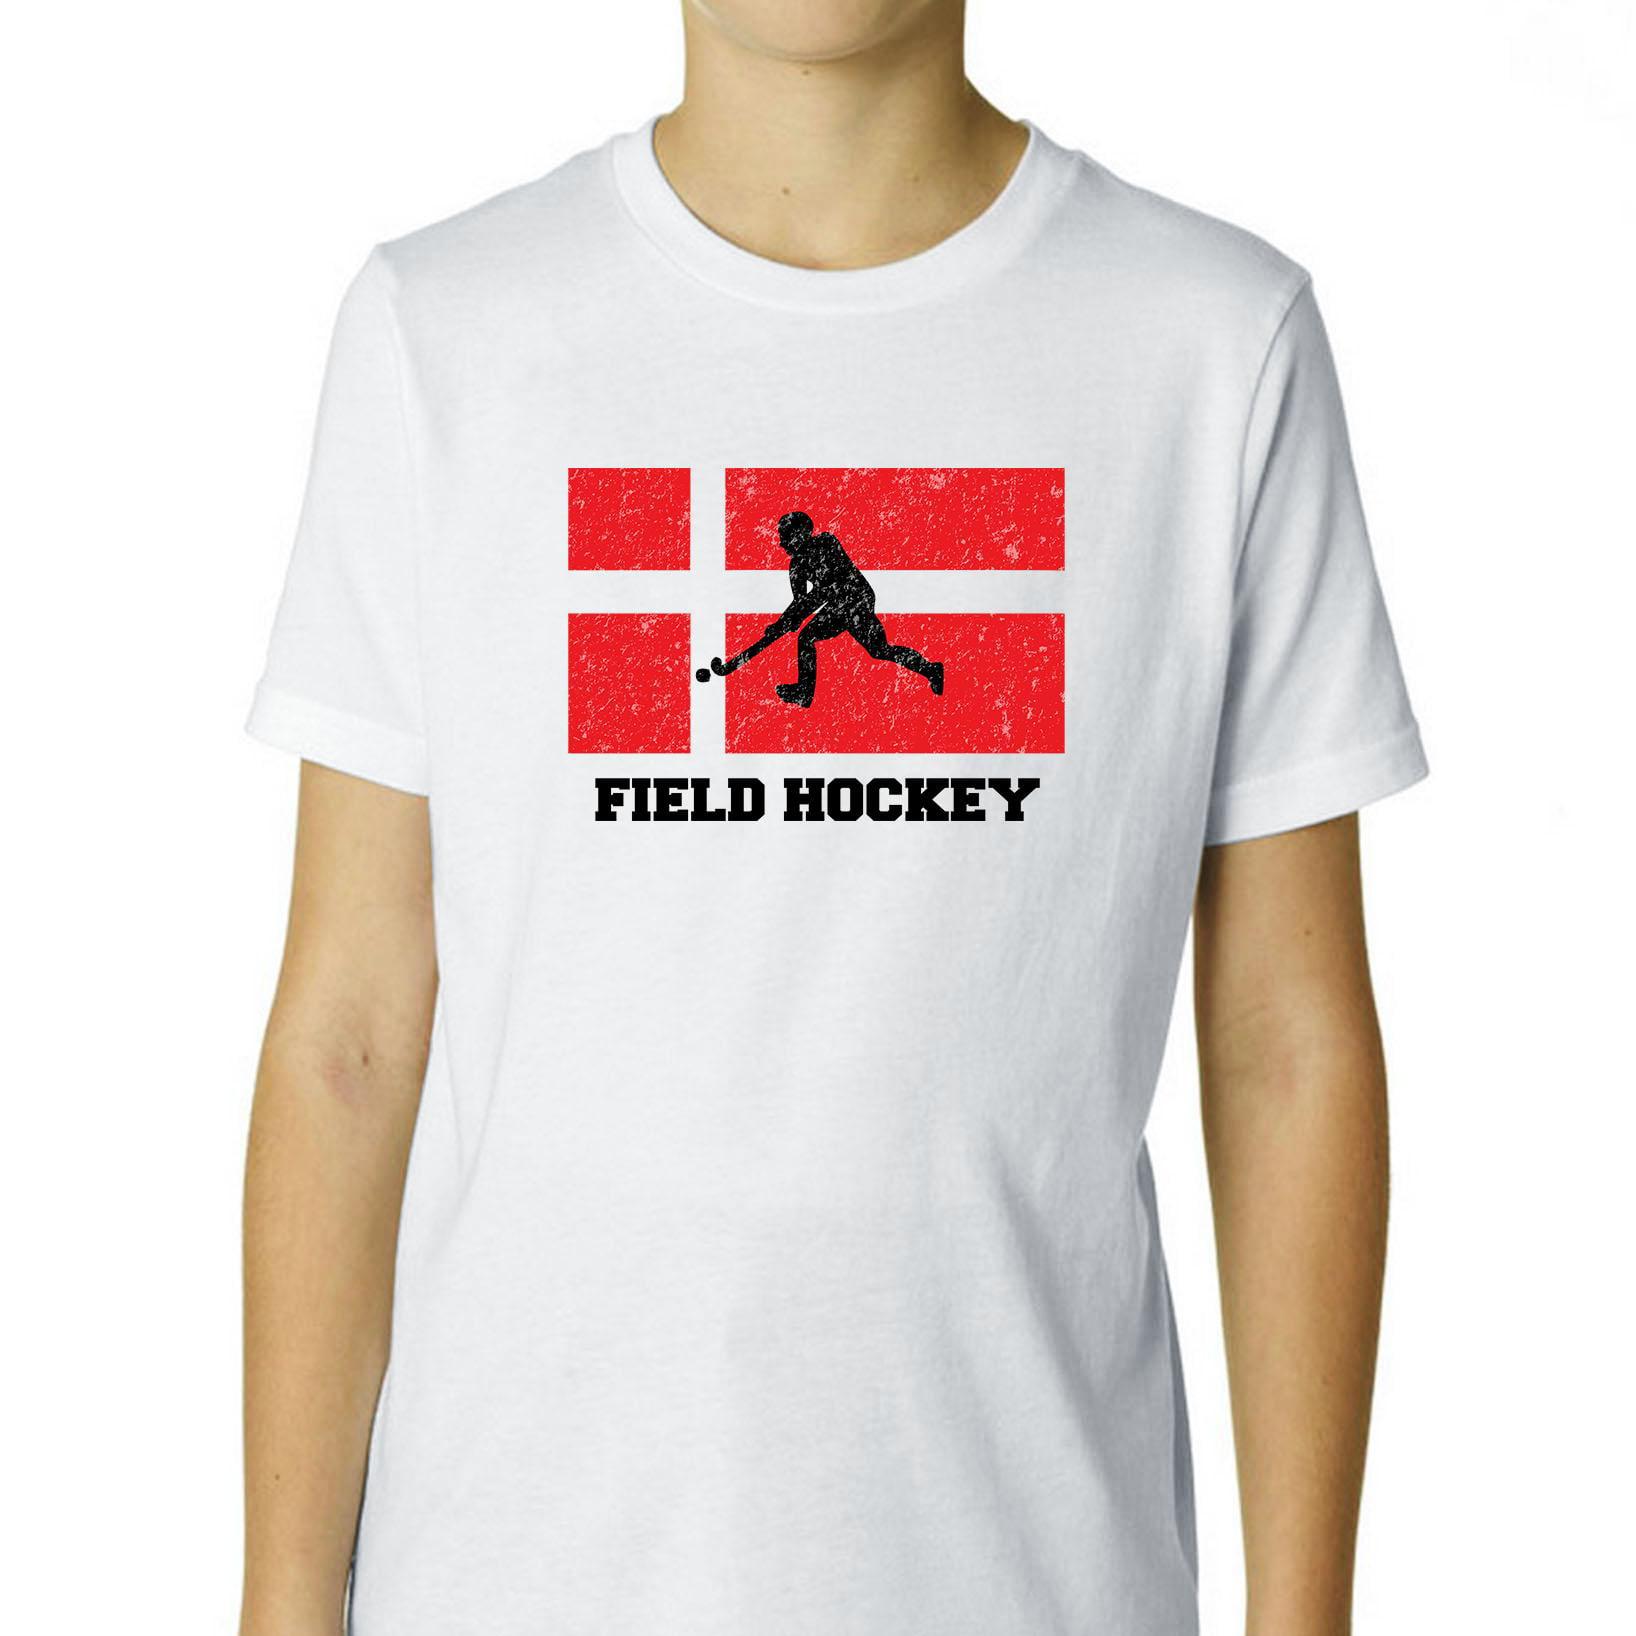 Denmark Olympic Field Hockey Flag Silhouette Boy's Cotton Youth T-Shirt by Hollywood Thread